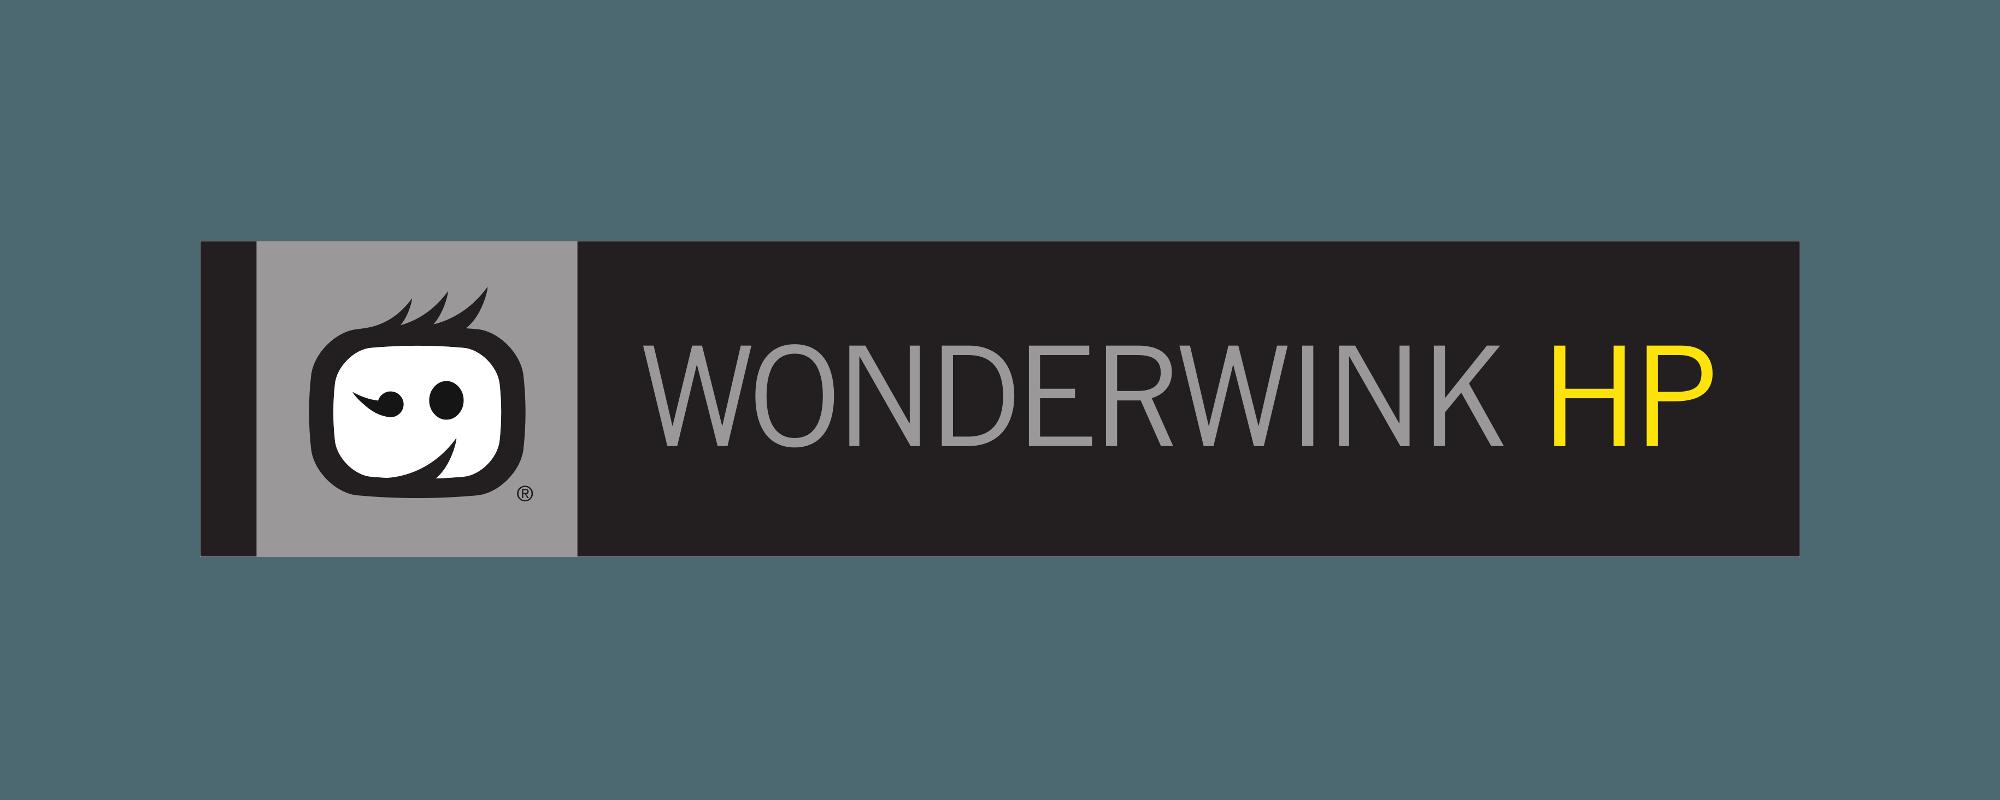 WonderWink HP